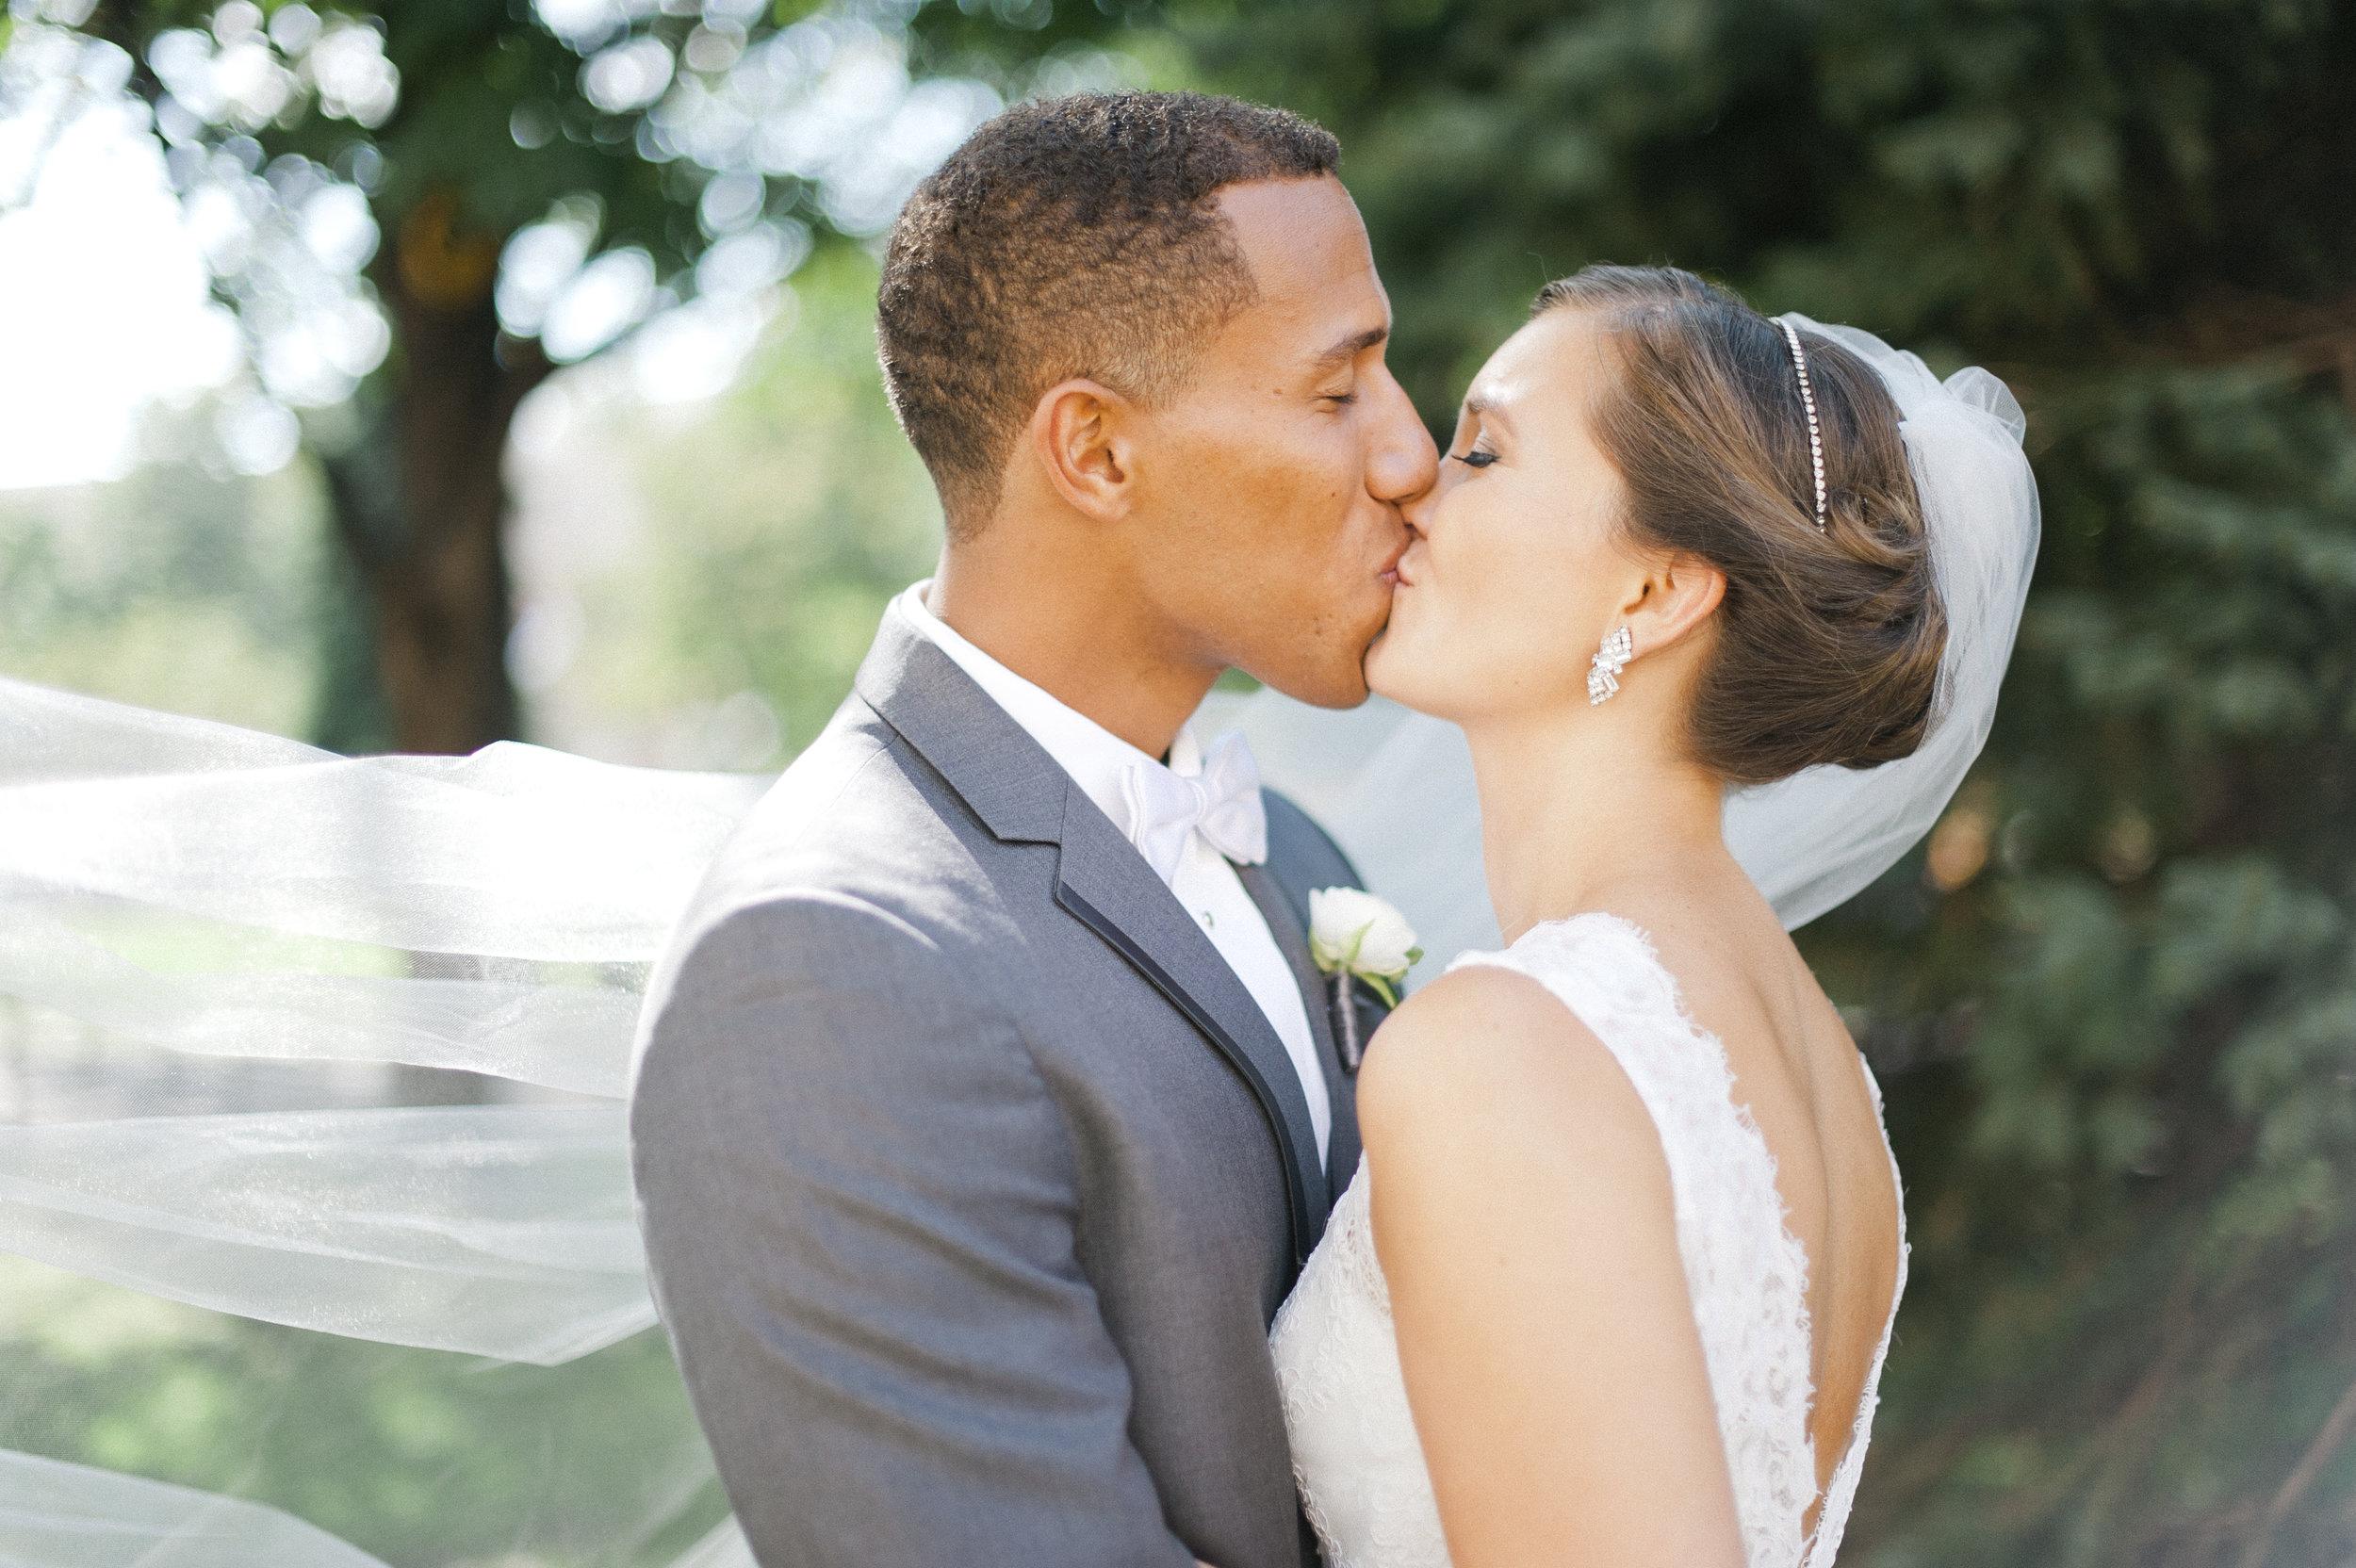 Lovell-Dillahunty Wedding_228.jpg